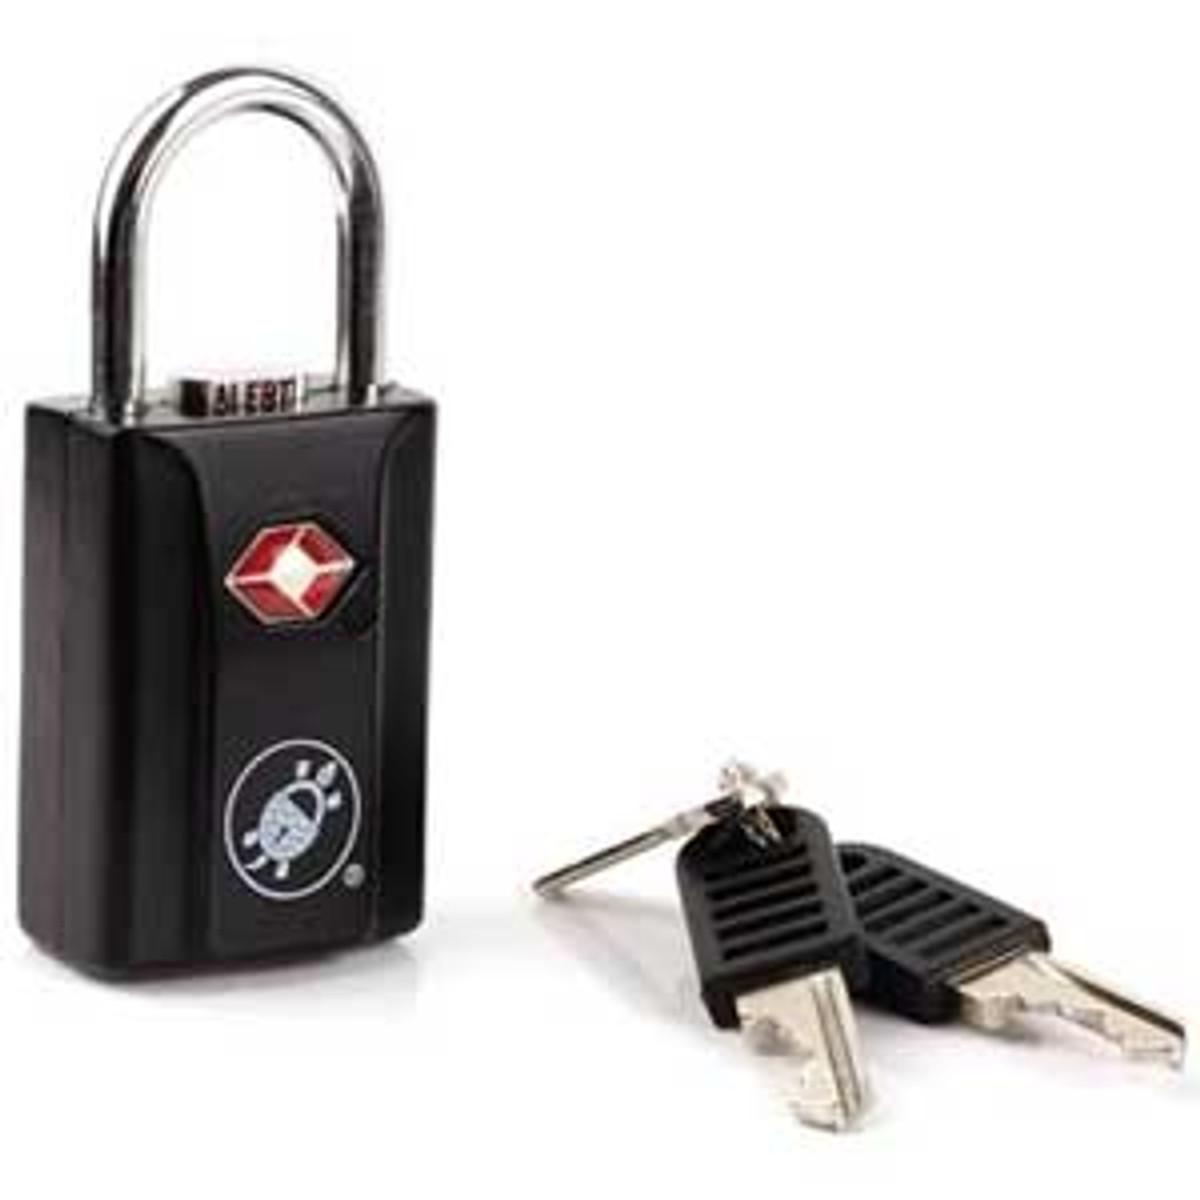 Pacsafe ProSafe 650 TSA approved padlock